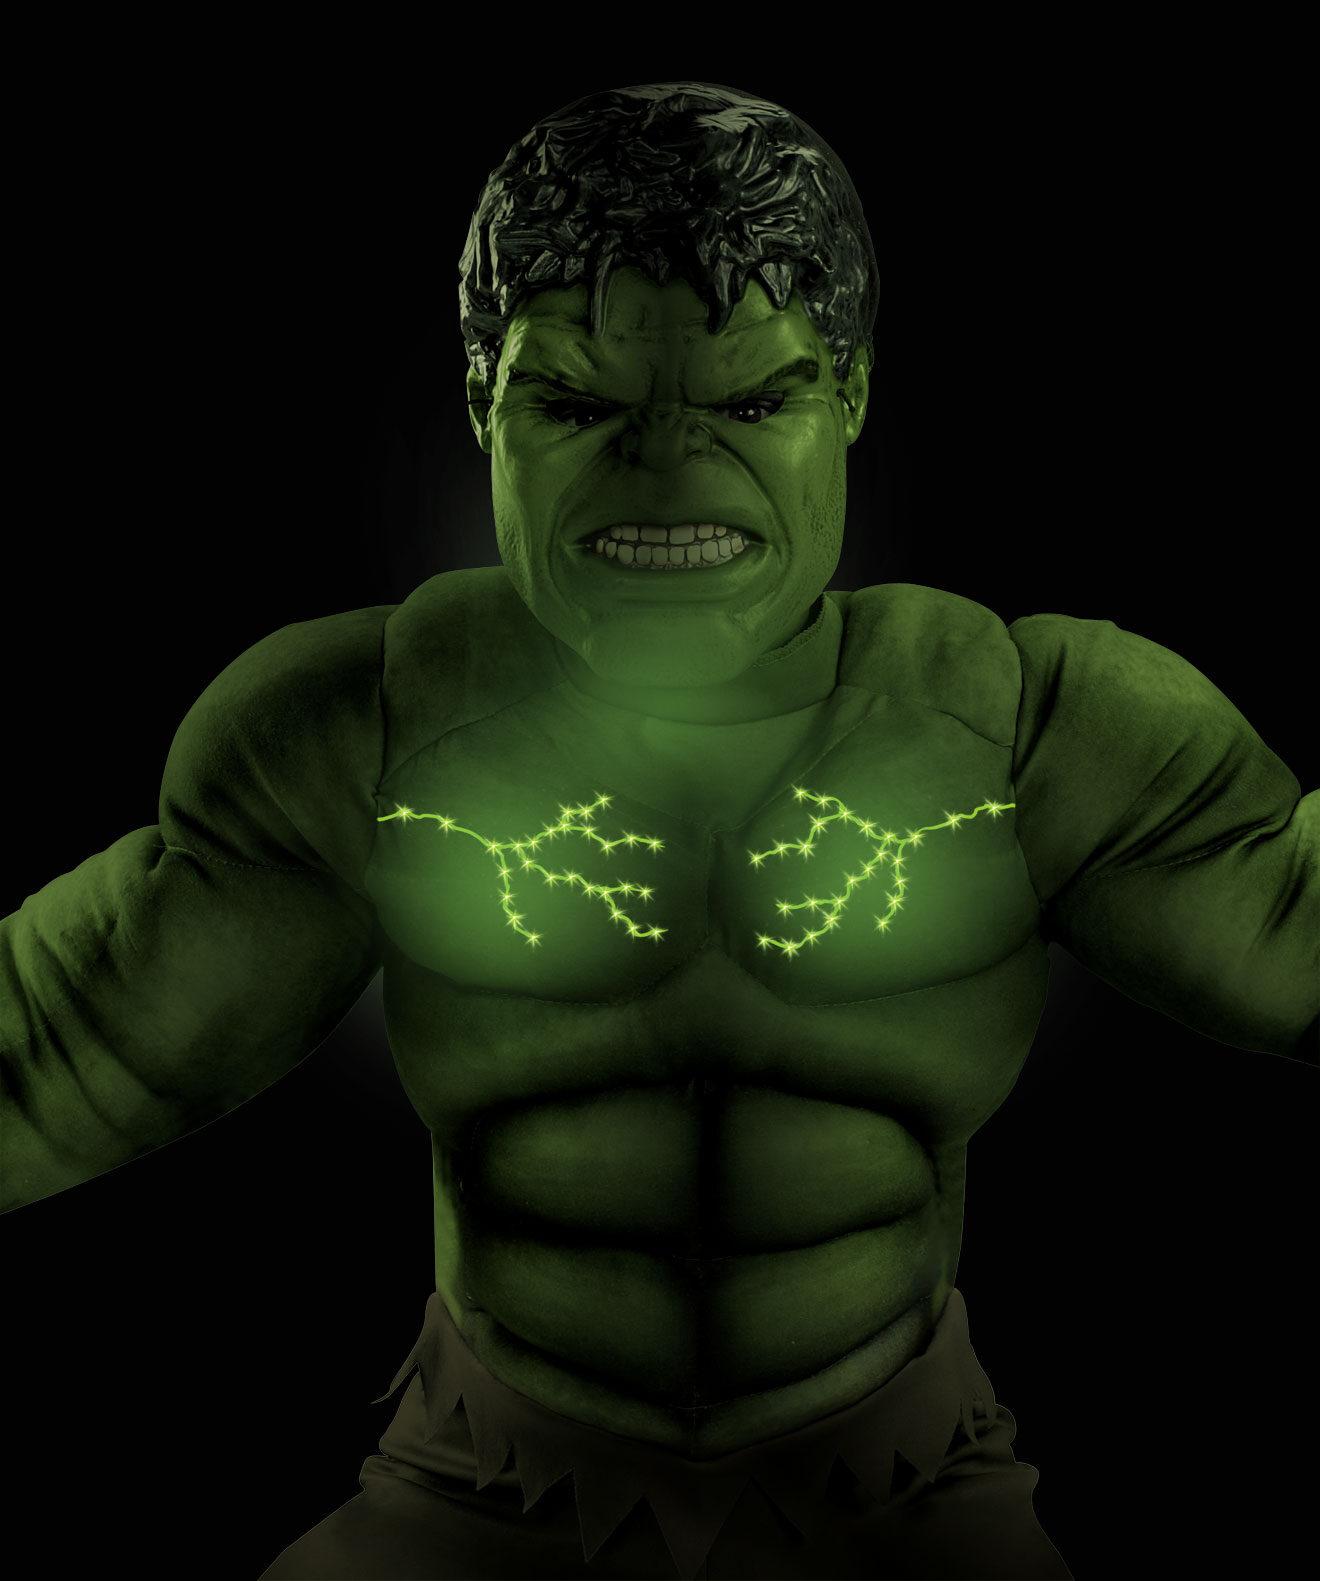 Boys Hulk Light Up Muscle Chest Avengers Kids Costume & Boys Hulk Light Up Muscle Chest Avengers Kids Costume - Mr. Costumes